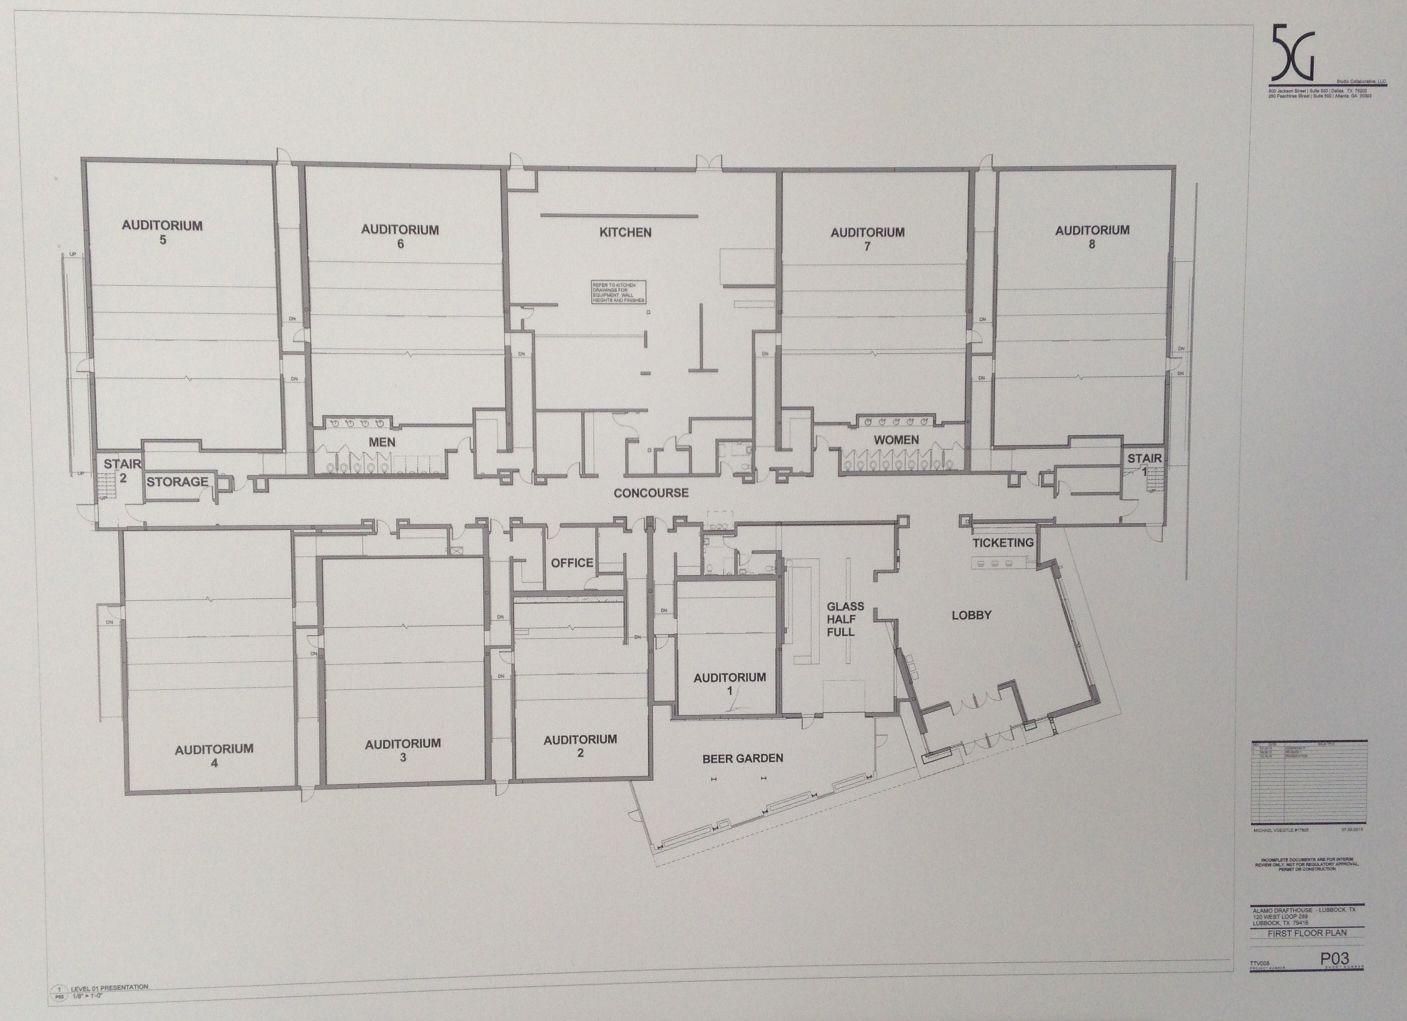 alamo drafthouse cinema floor plans - Google Search   Cinema/Movie ...